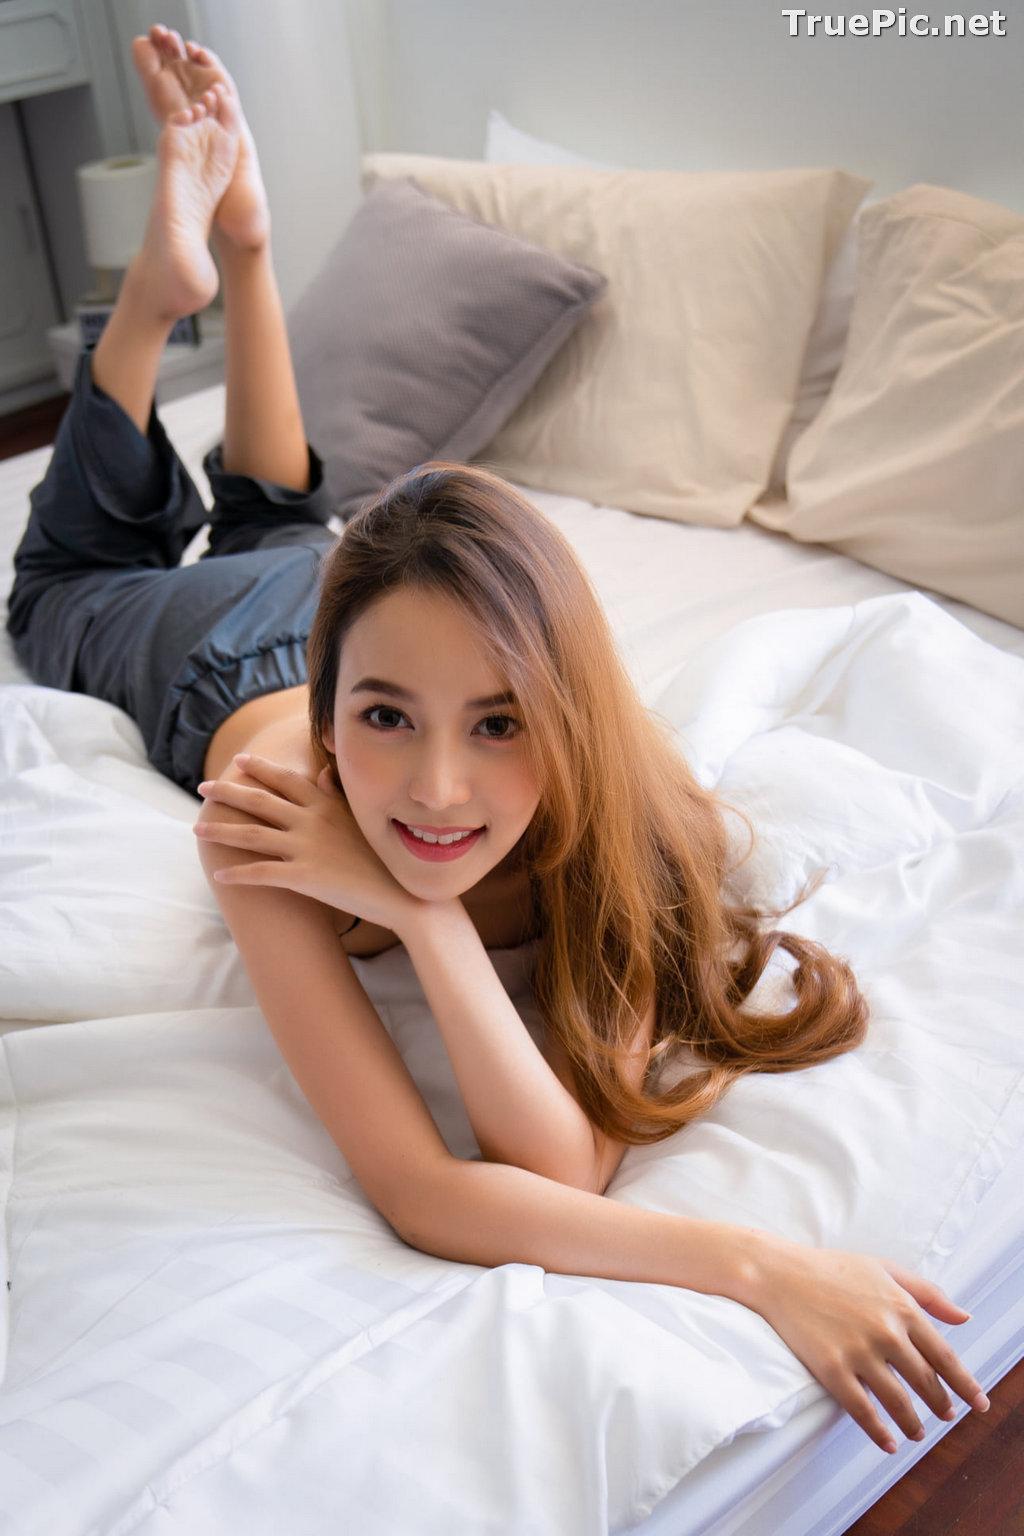 Image Thailand Model - Noppawan Limapirak (น้องเมย์) - Beautiful Picture 2021 Collection - TruePic.net - Picture-63